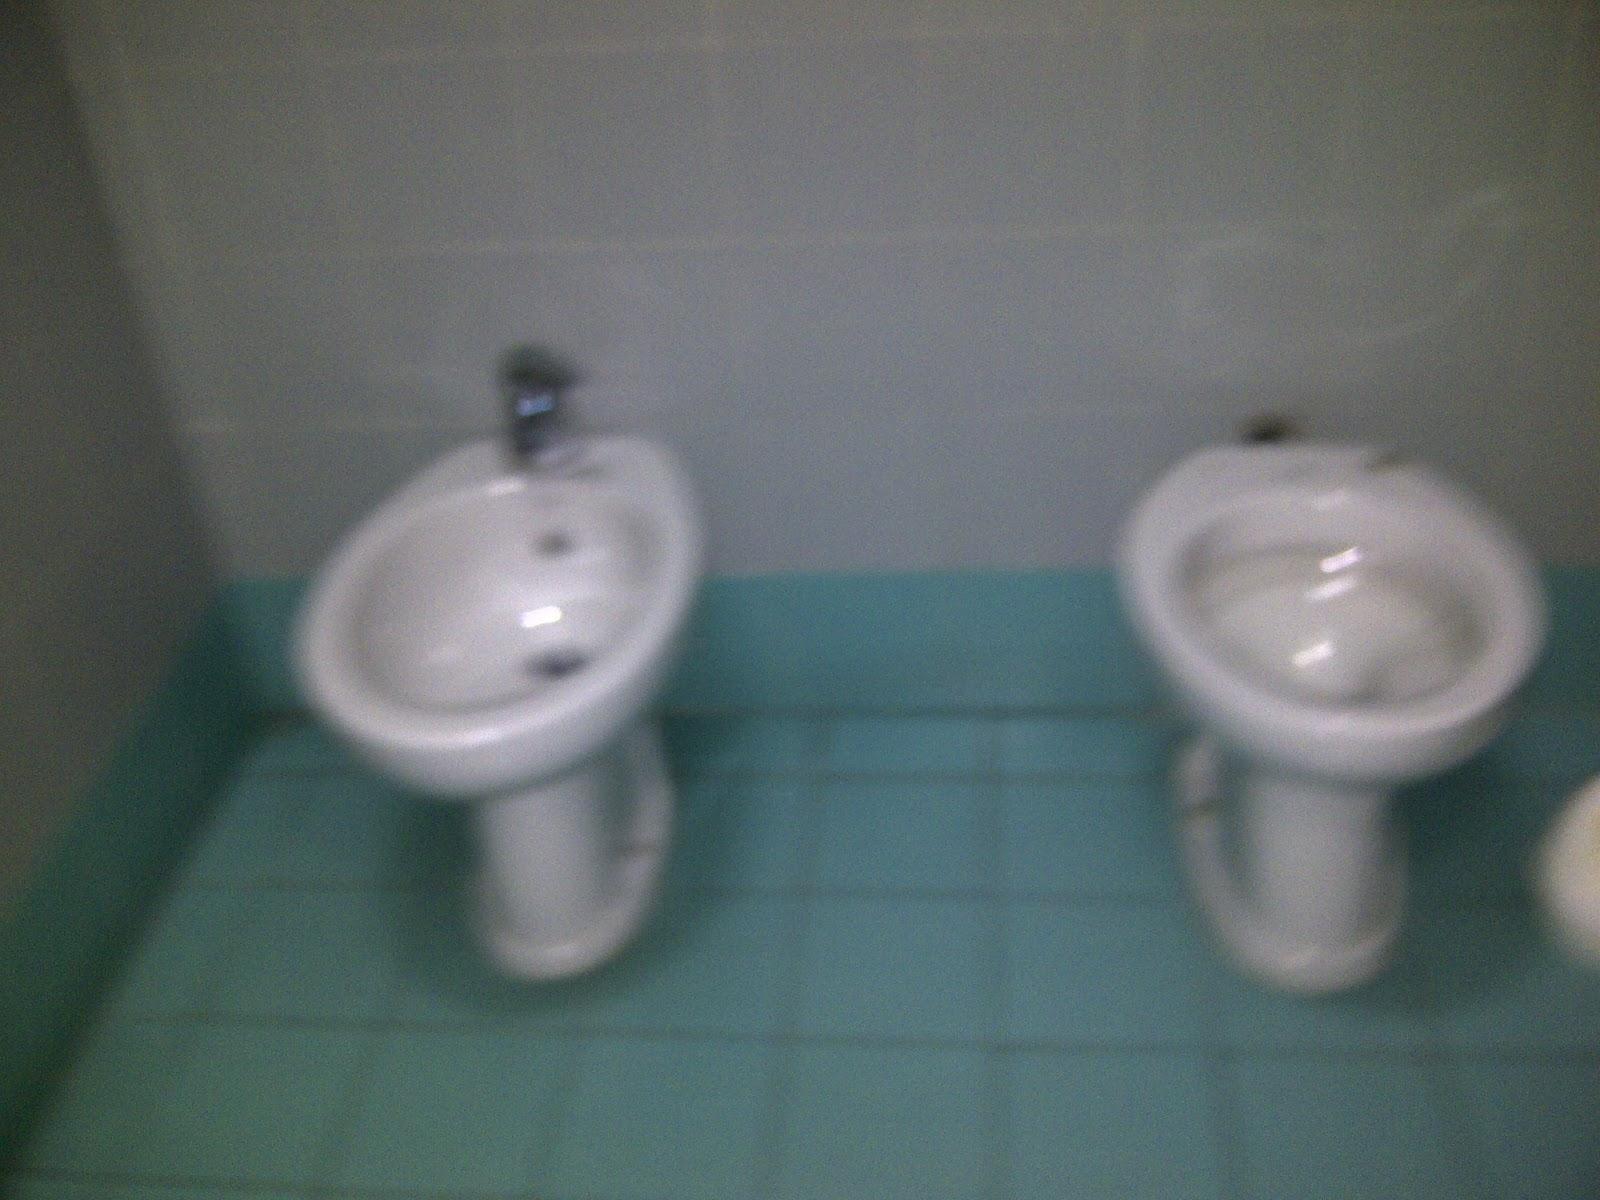 mount and bidets floor bathroom toilet catalano toilets bidet sfera